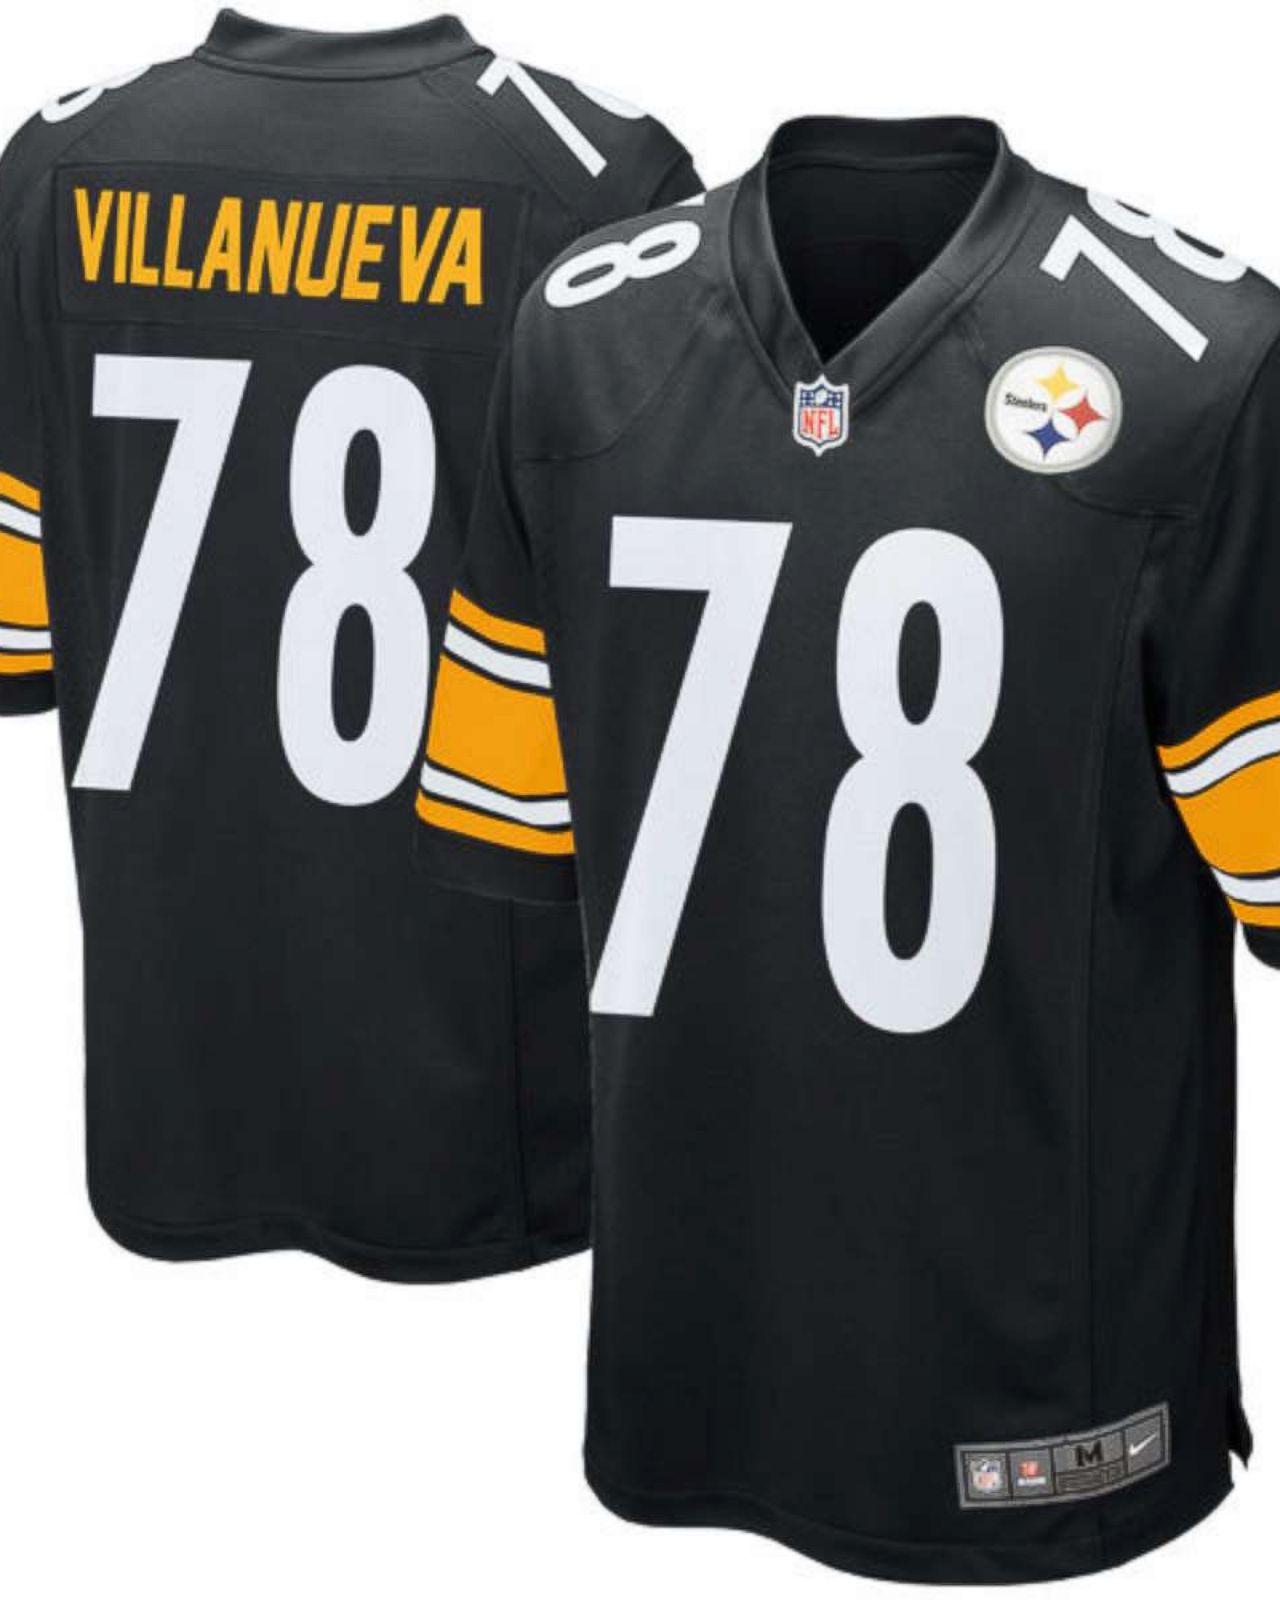 online store 25c72 86260 Steelers' Alejandro Villanueva donating proceeds from jersey ...